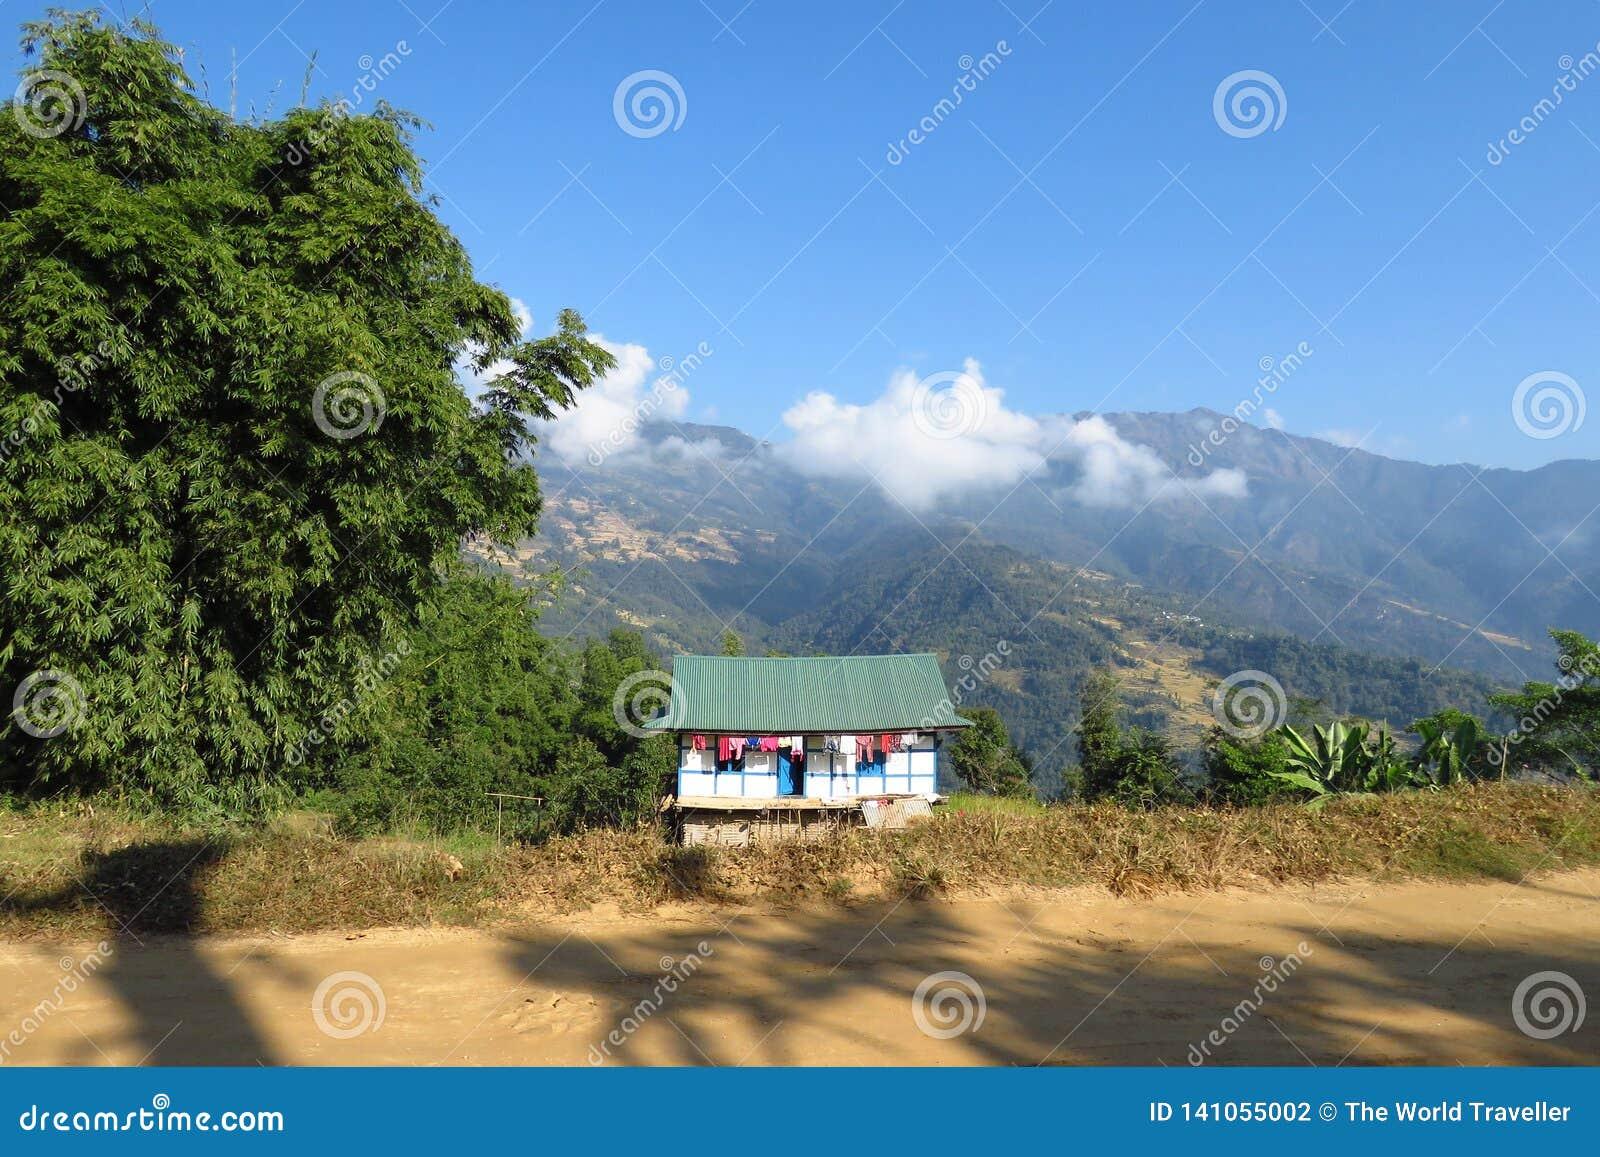 House in a beautiful mountain landscape, Khandbari, Nepal